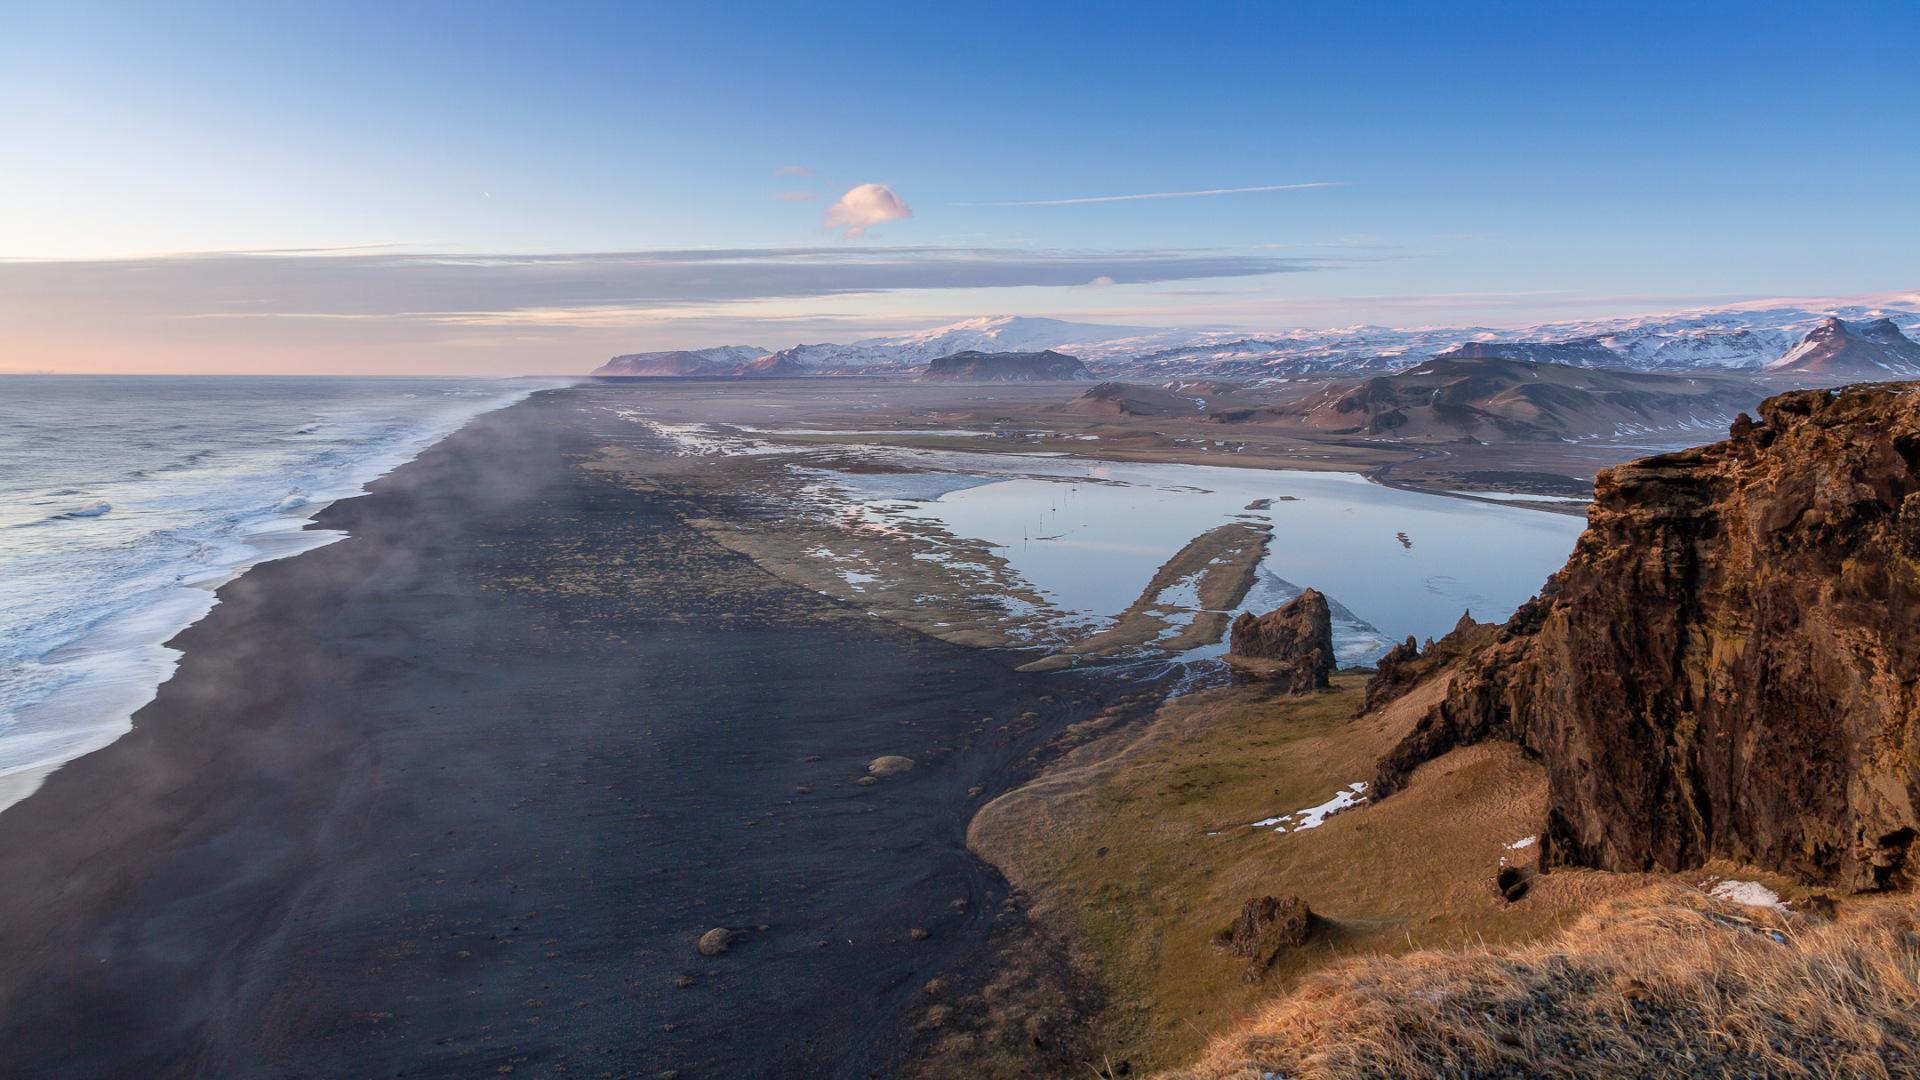 From Dyrholaey to Eyjafjallajökull